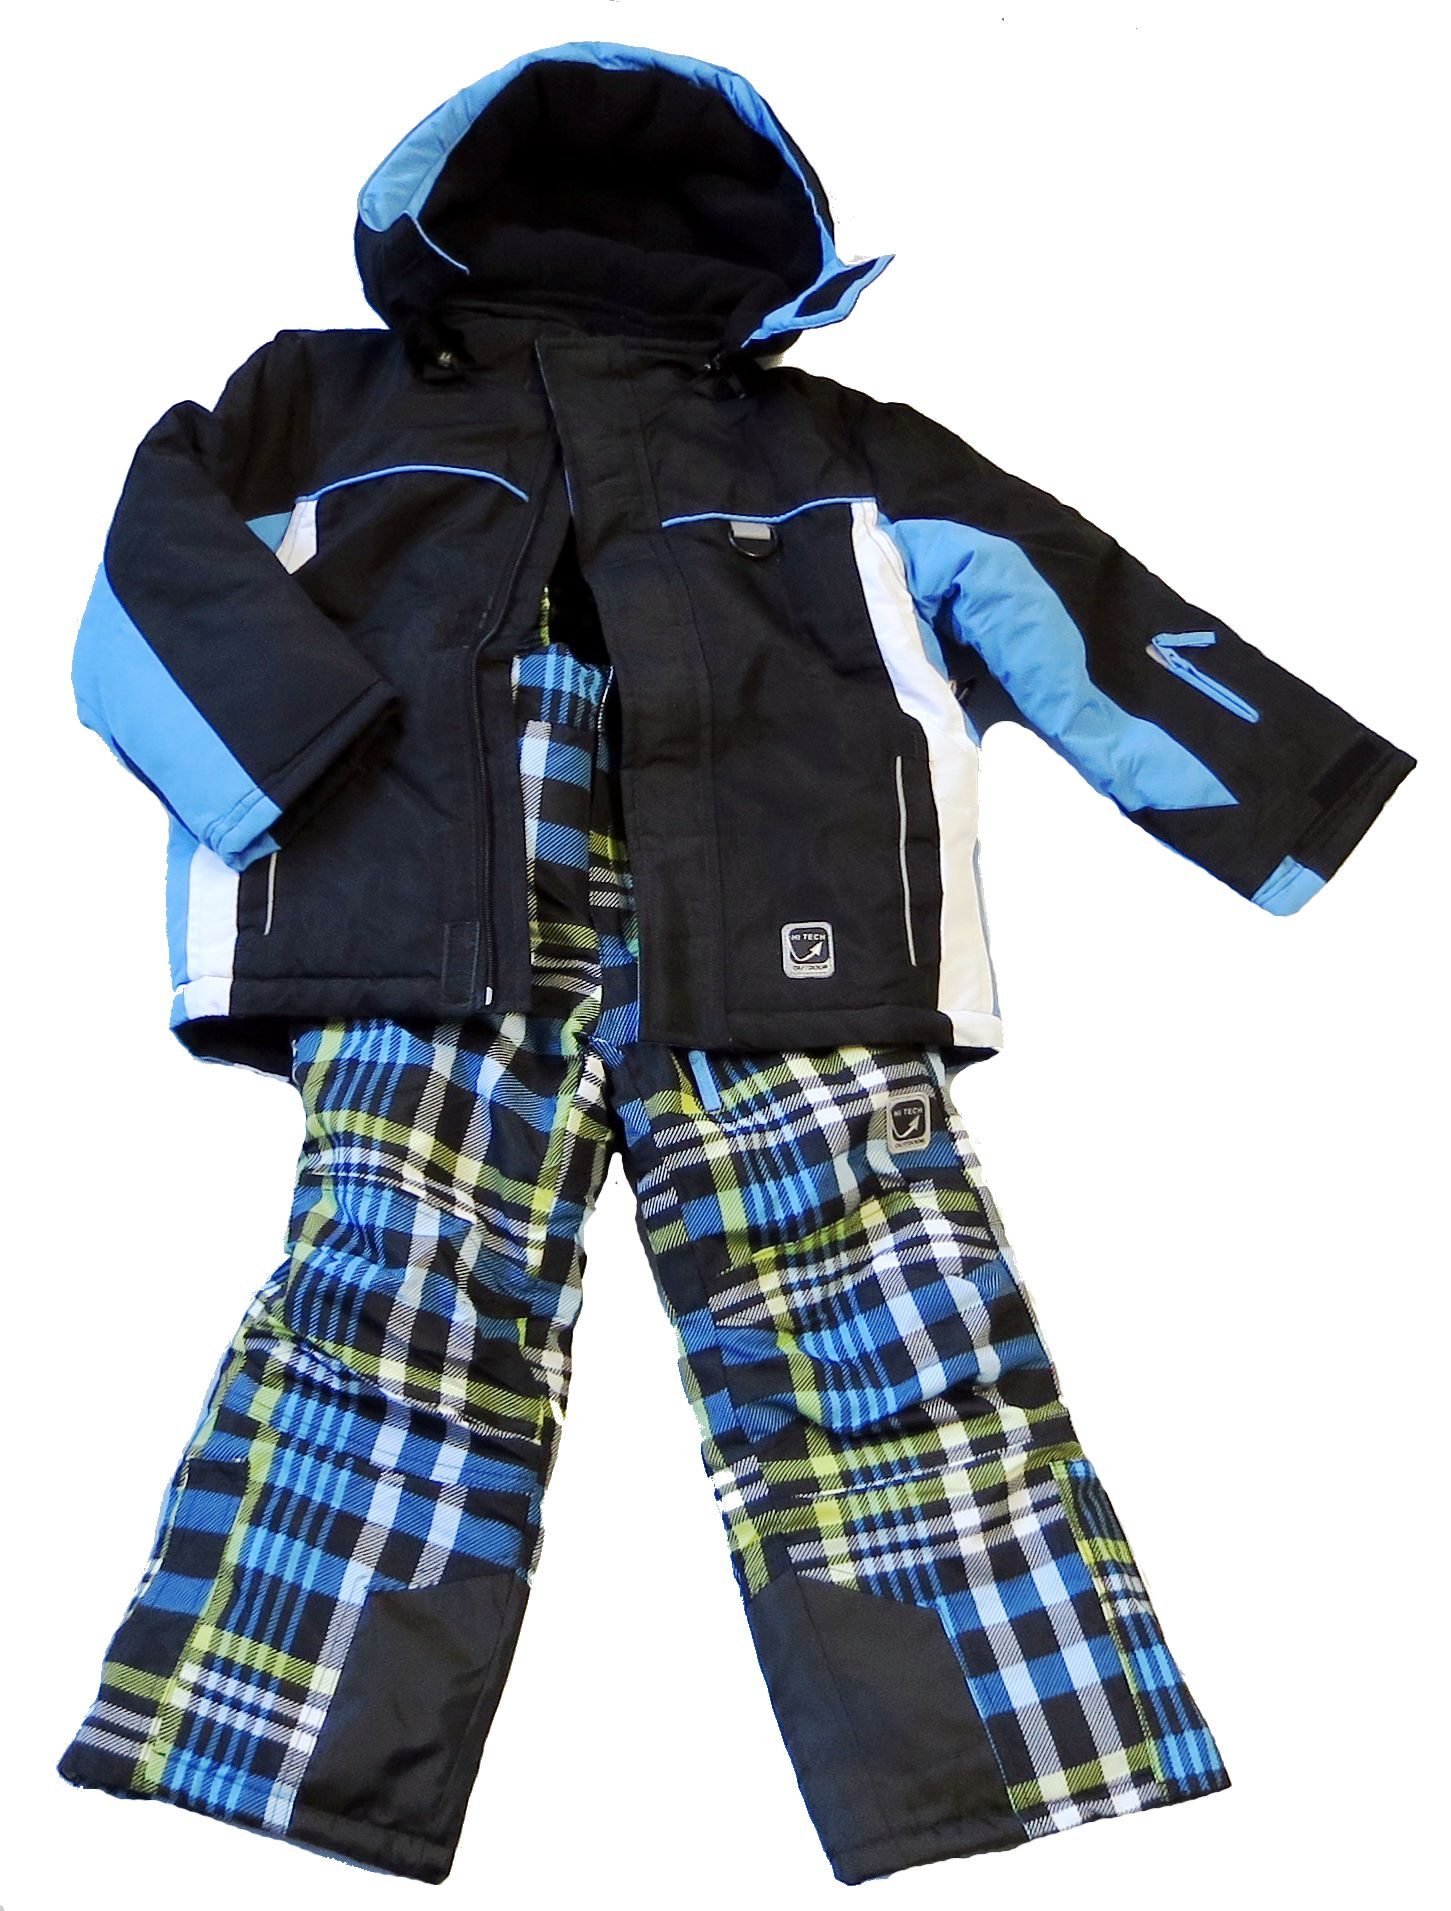 Kinder-Jungen-Maedchen-Skianzug-Schneeanzug-hightech-fashion-Anzug-Jacke-Hose